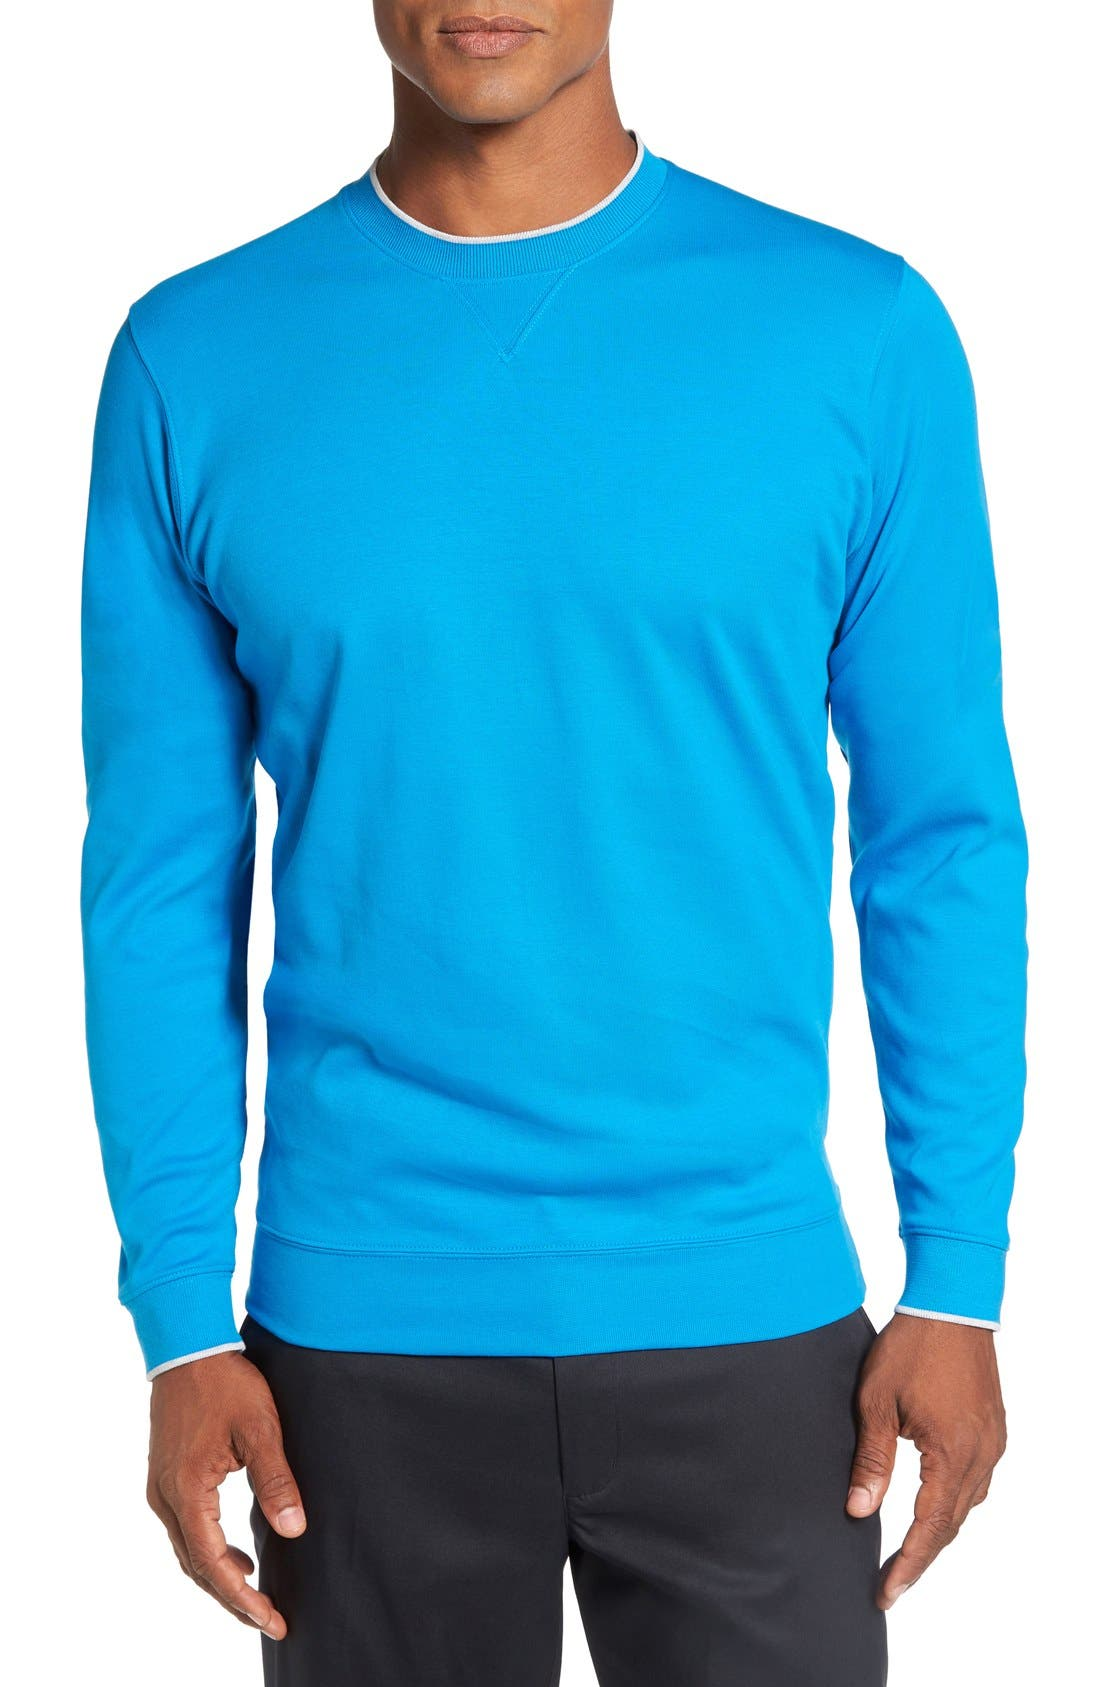 Bobby Jones 'Walker' Tipped Pima Cotton Long Sleeve T-Shirt